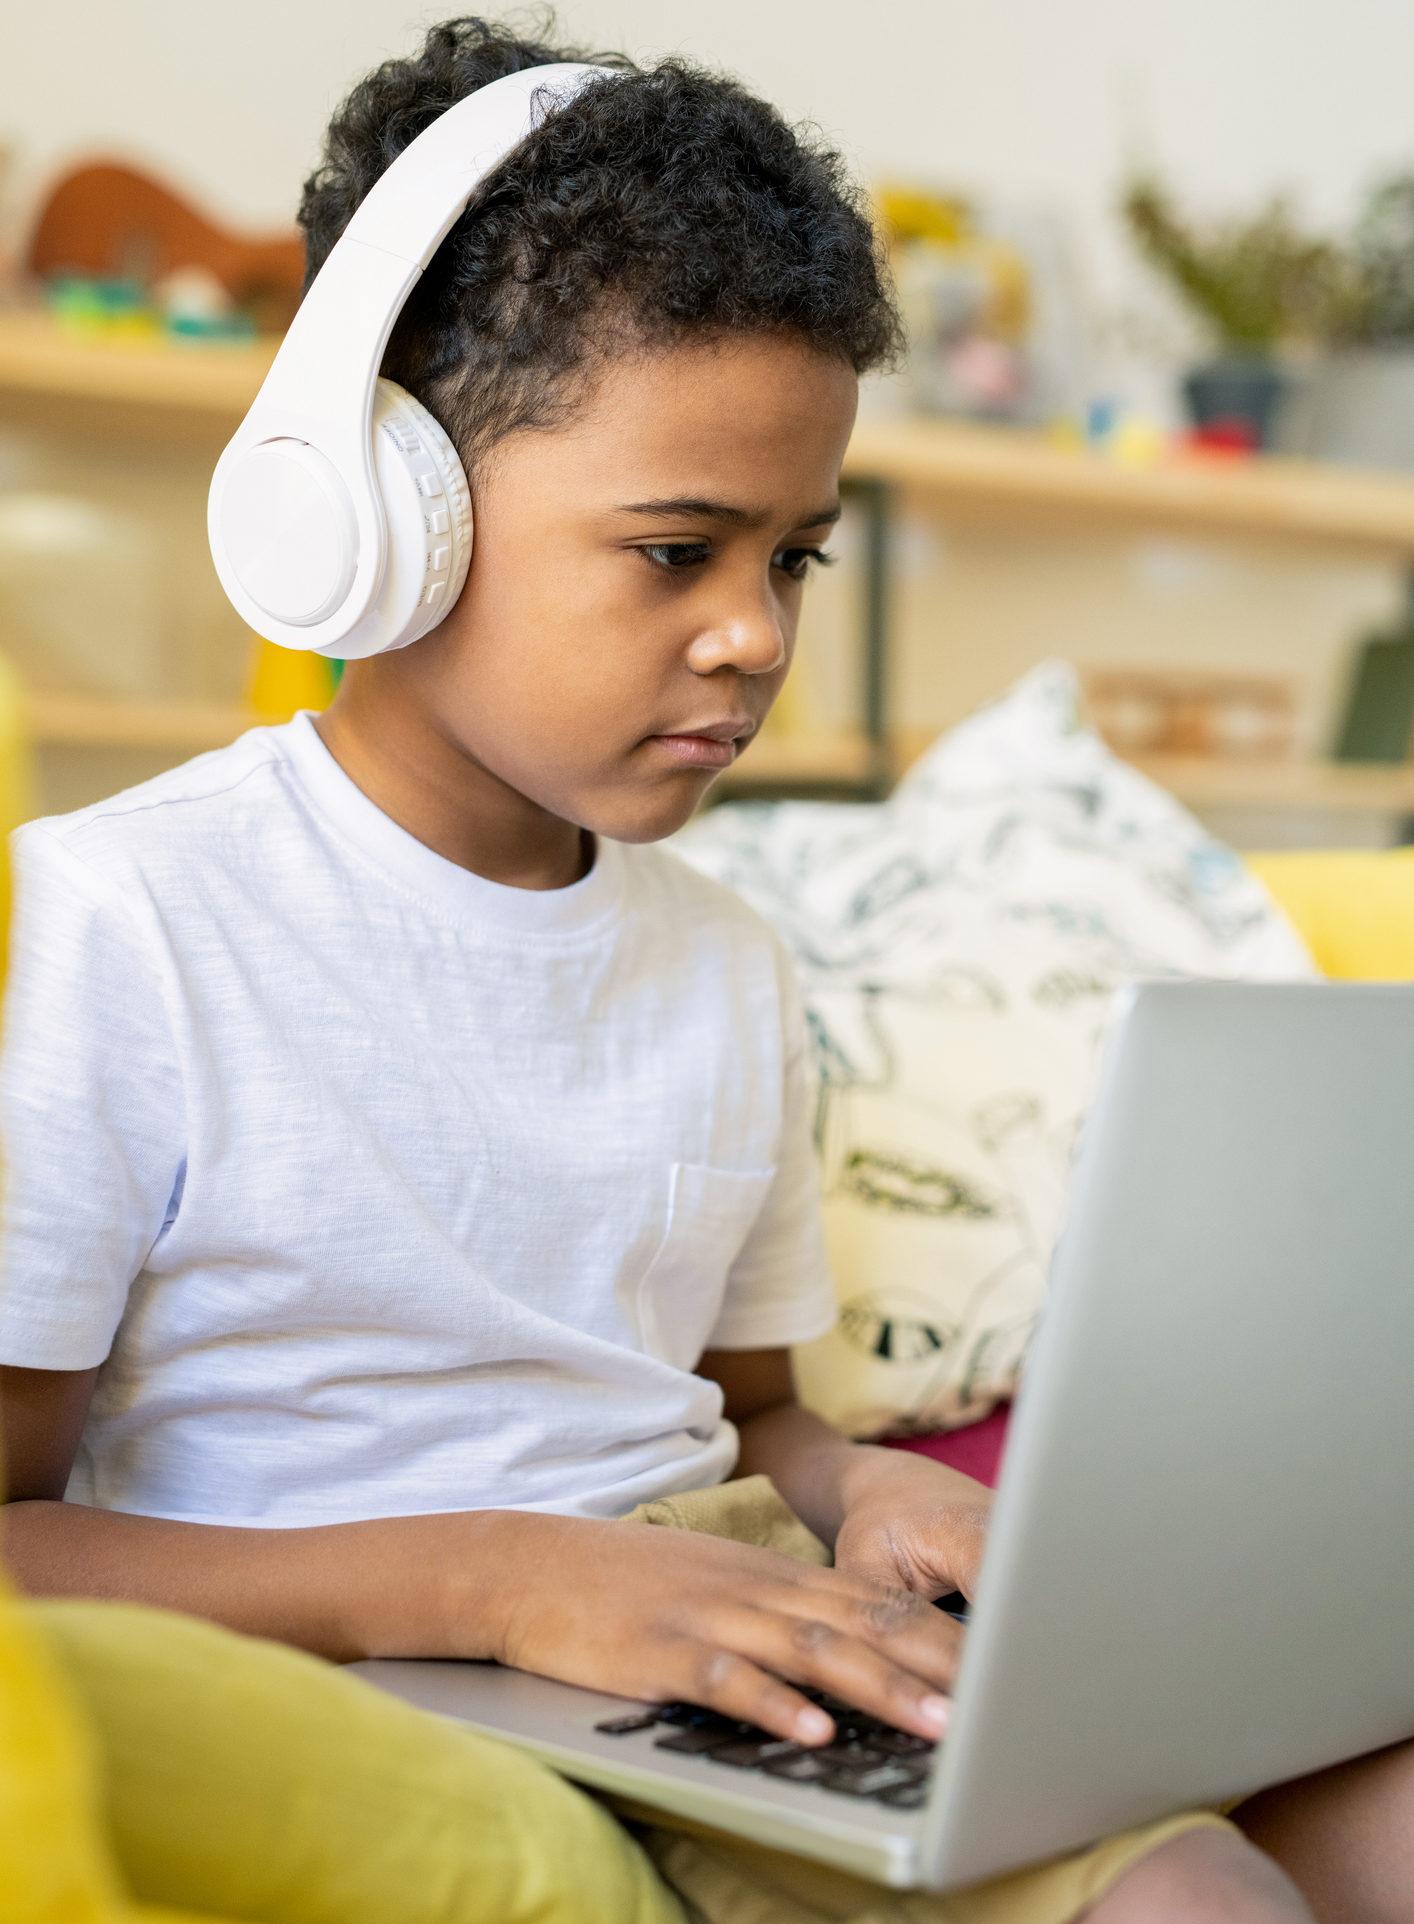 School kid working on homework on his laptop